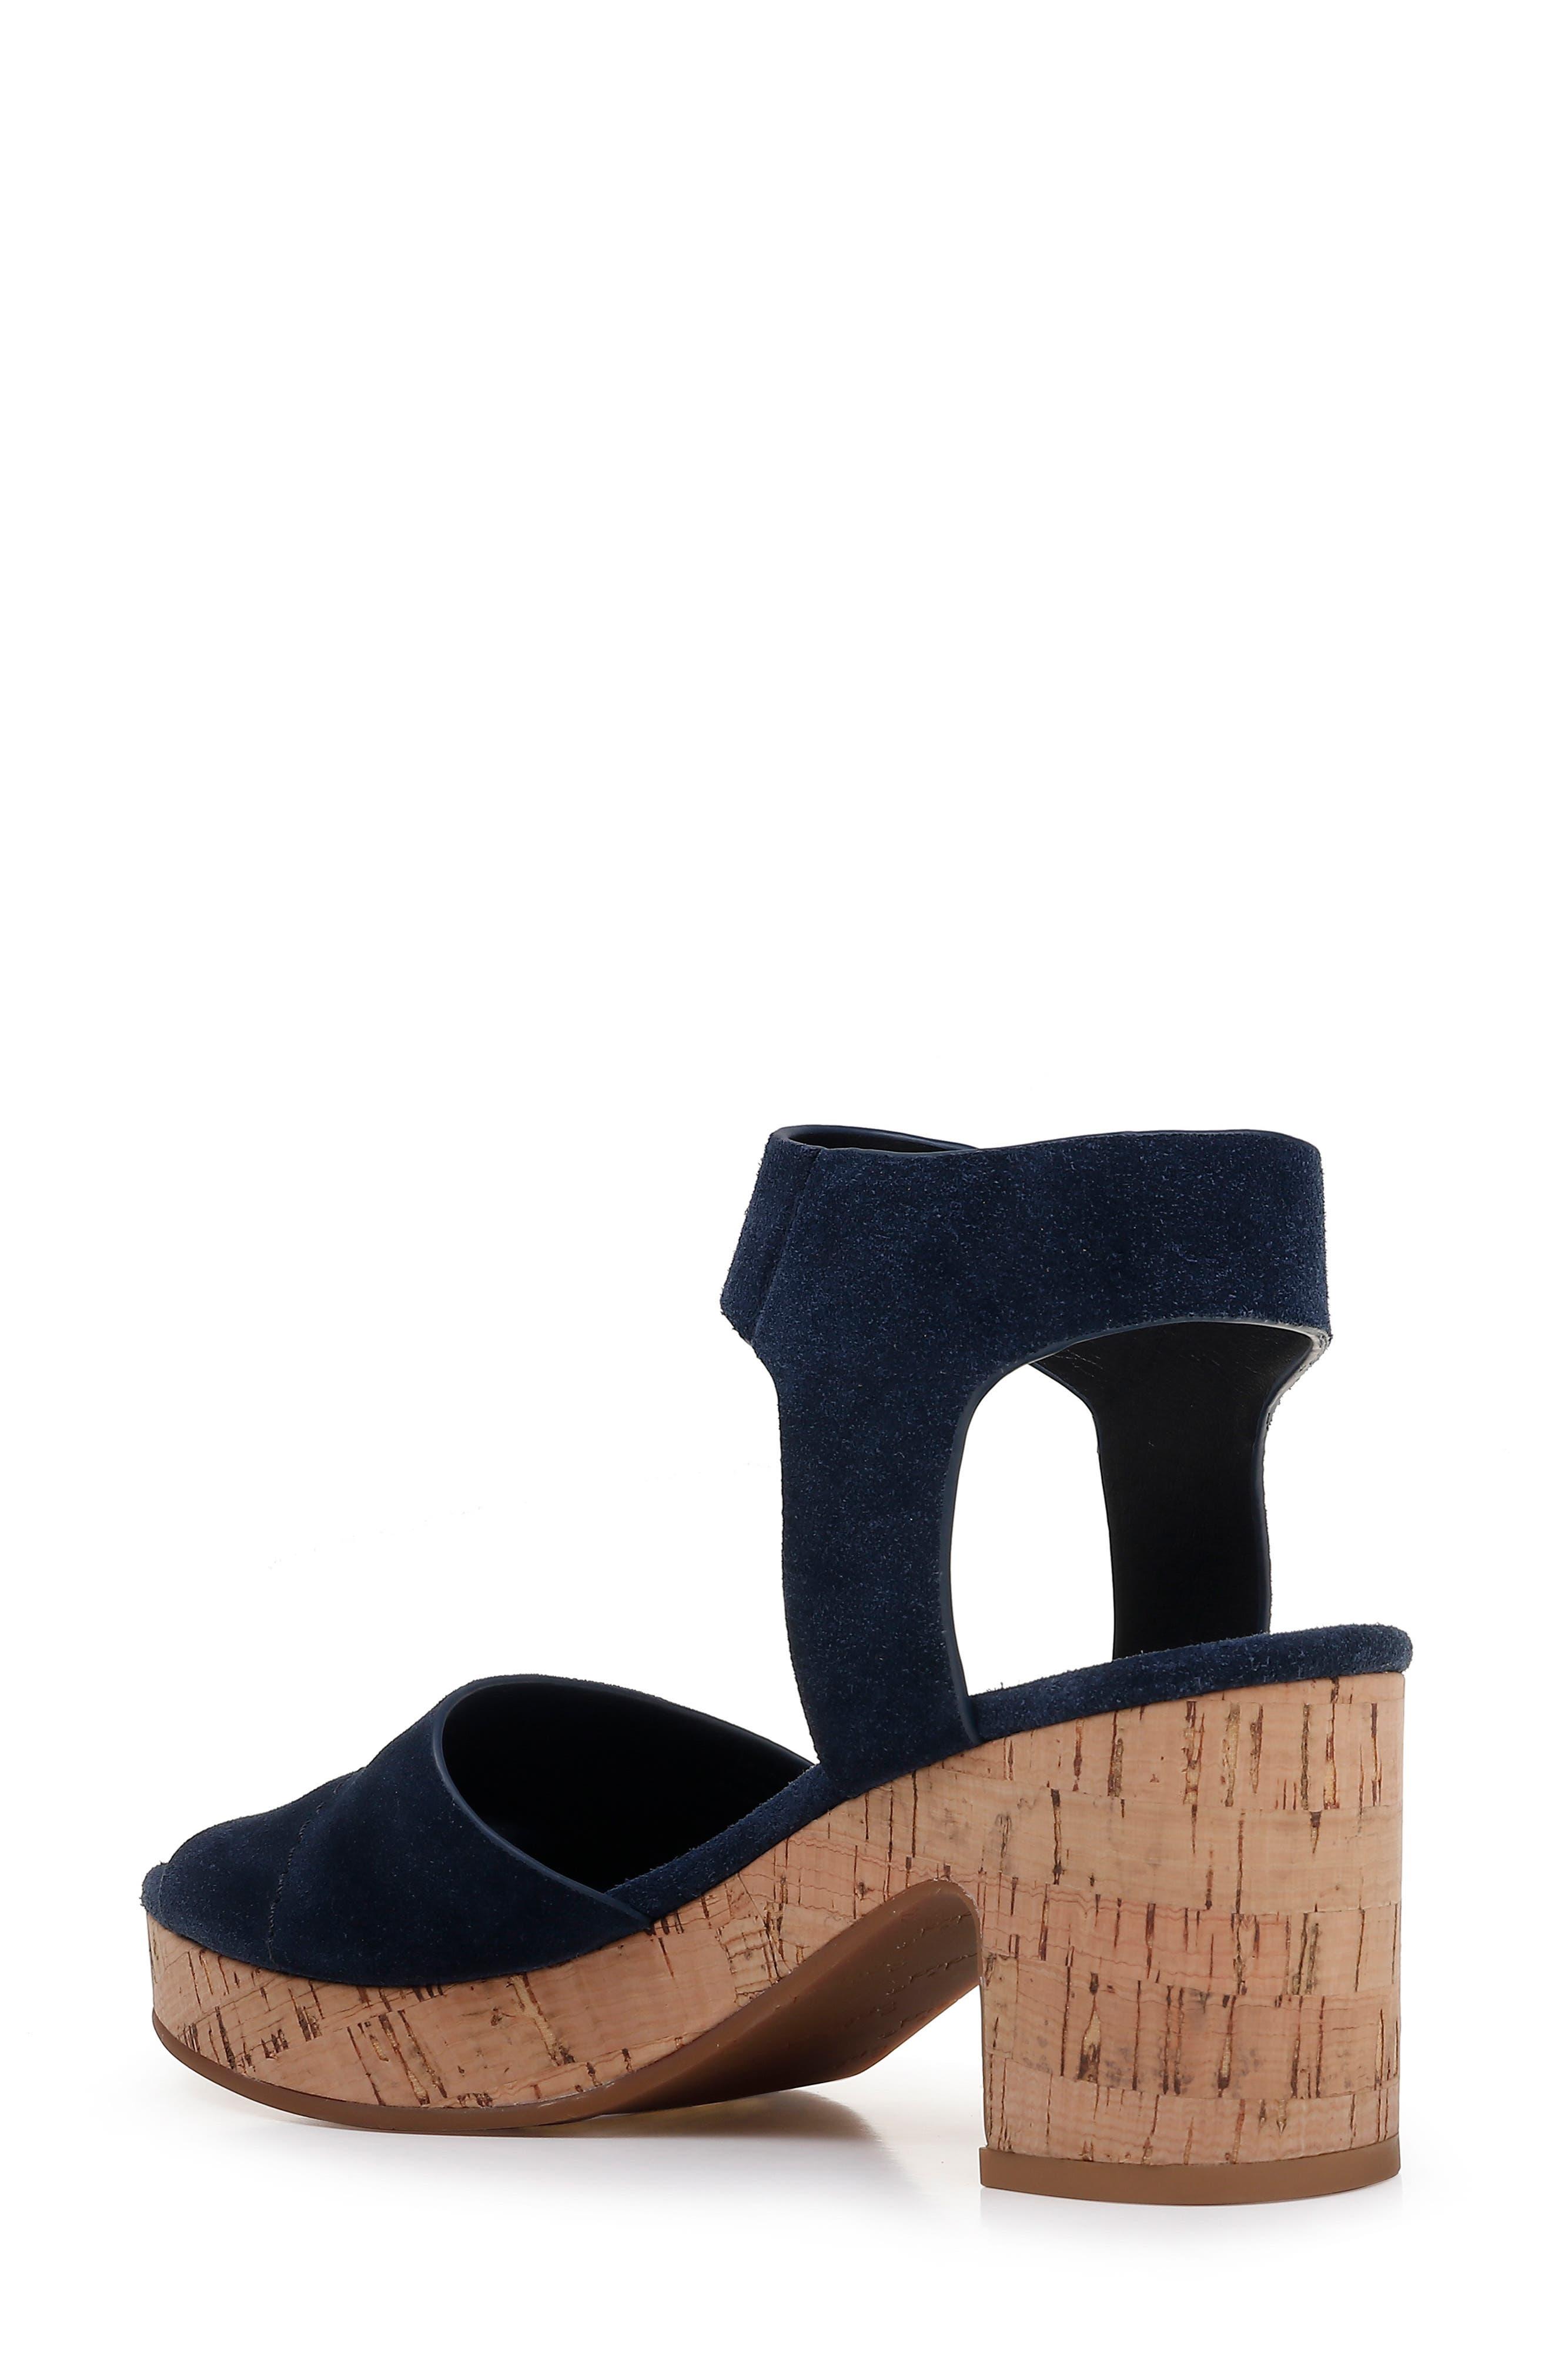 SPLENDID, Thatcher Platform Ankle Strap Sandal, Alternate thumbnail 2, color, NAVY SUEDE